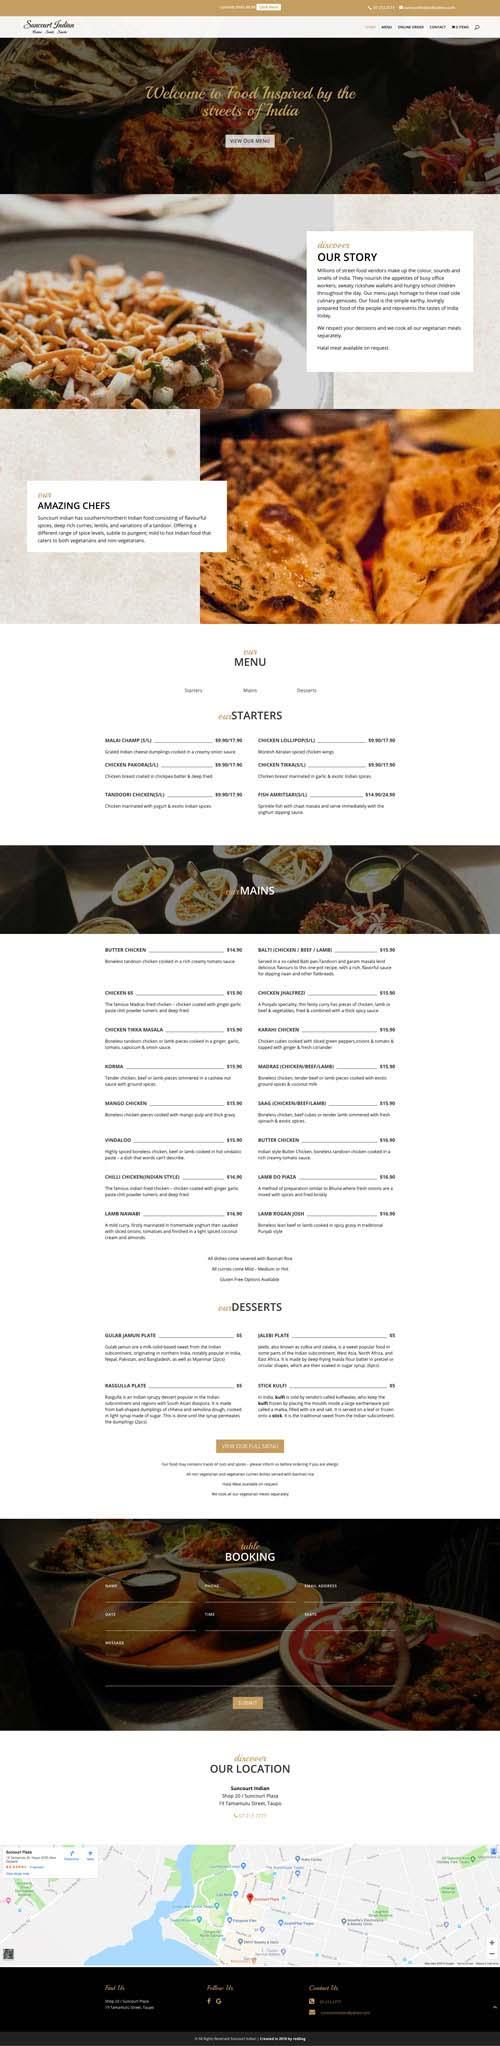 Suncourt Indian Task Bins Website Design and Development